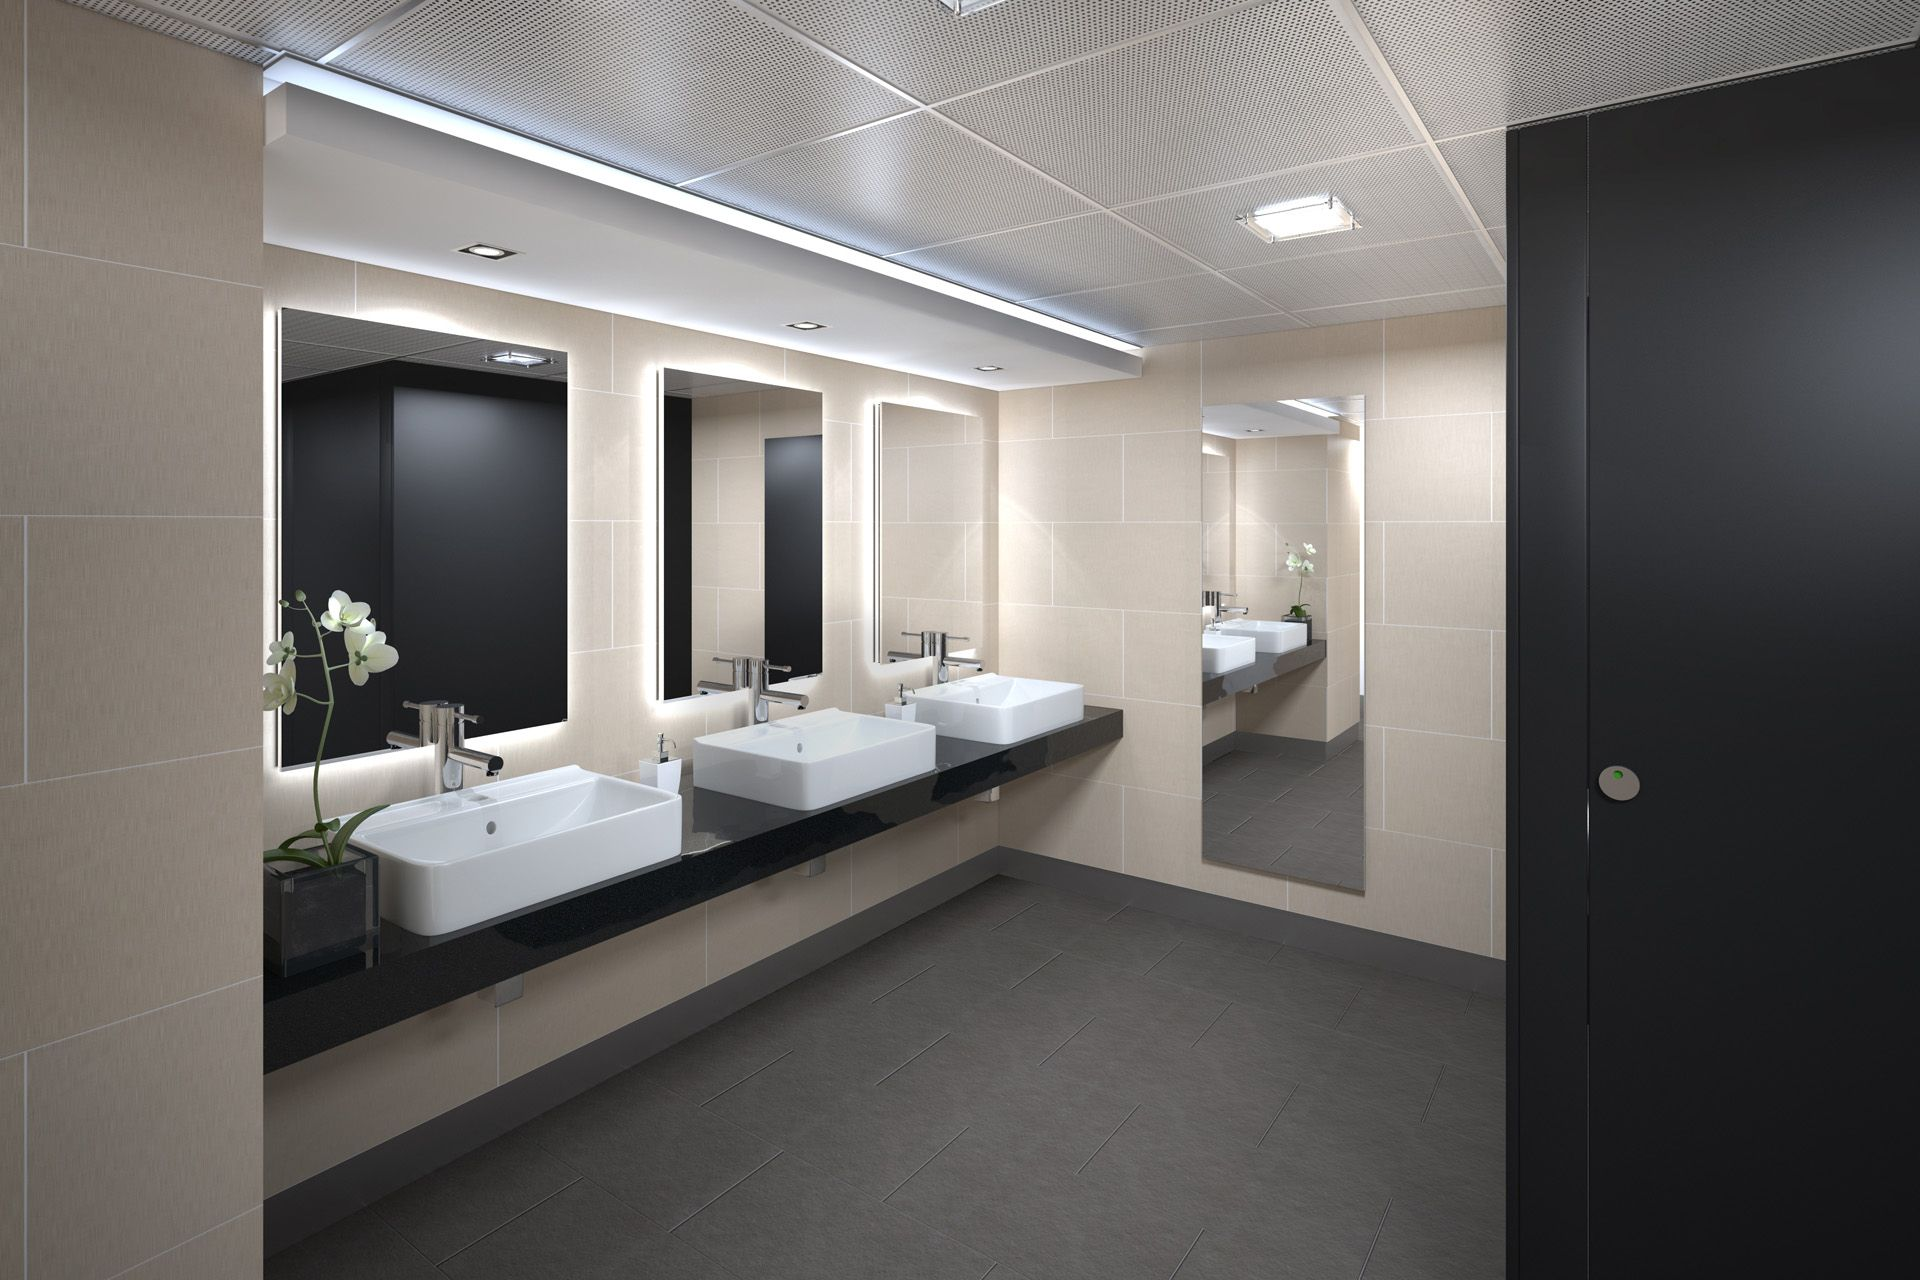 Commercial Bathroom Design Commercial Bathroom Designs Washroom